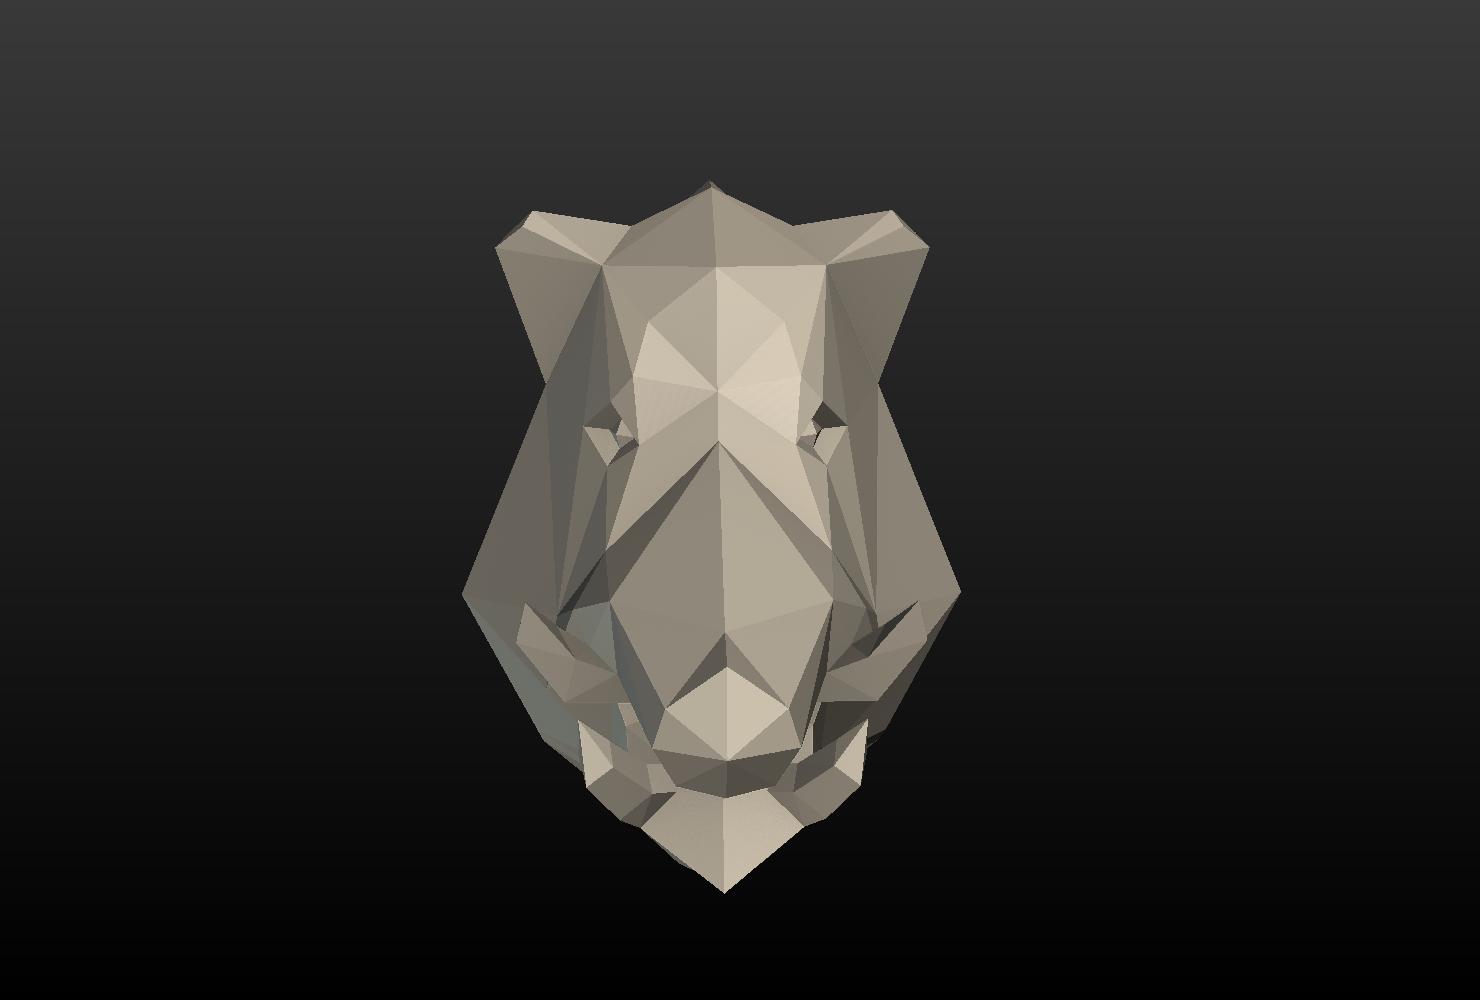 Boars_LP_Head-0009.png Download 3DS file Boar Head Low Poly • 3D print model, Skazok